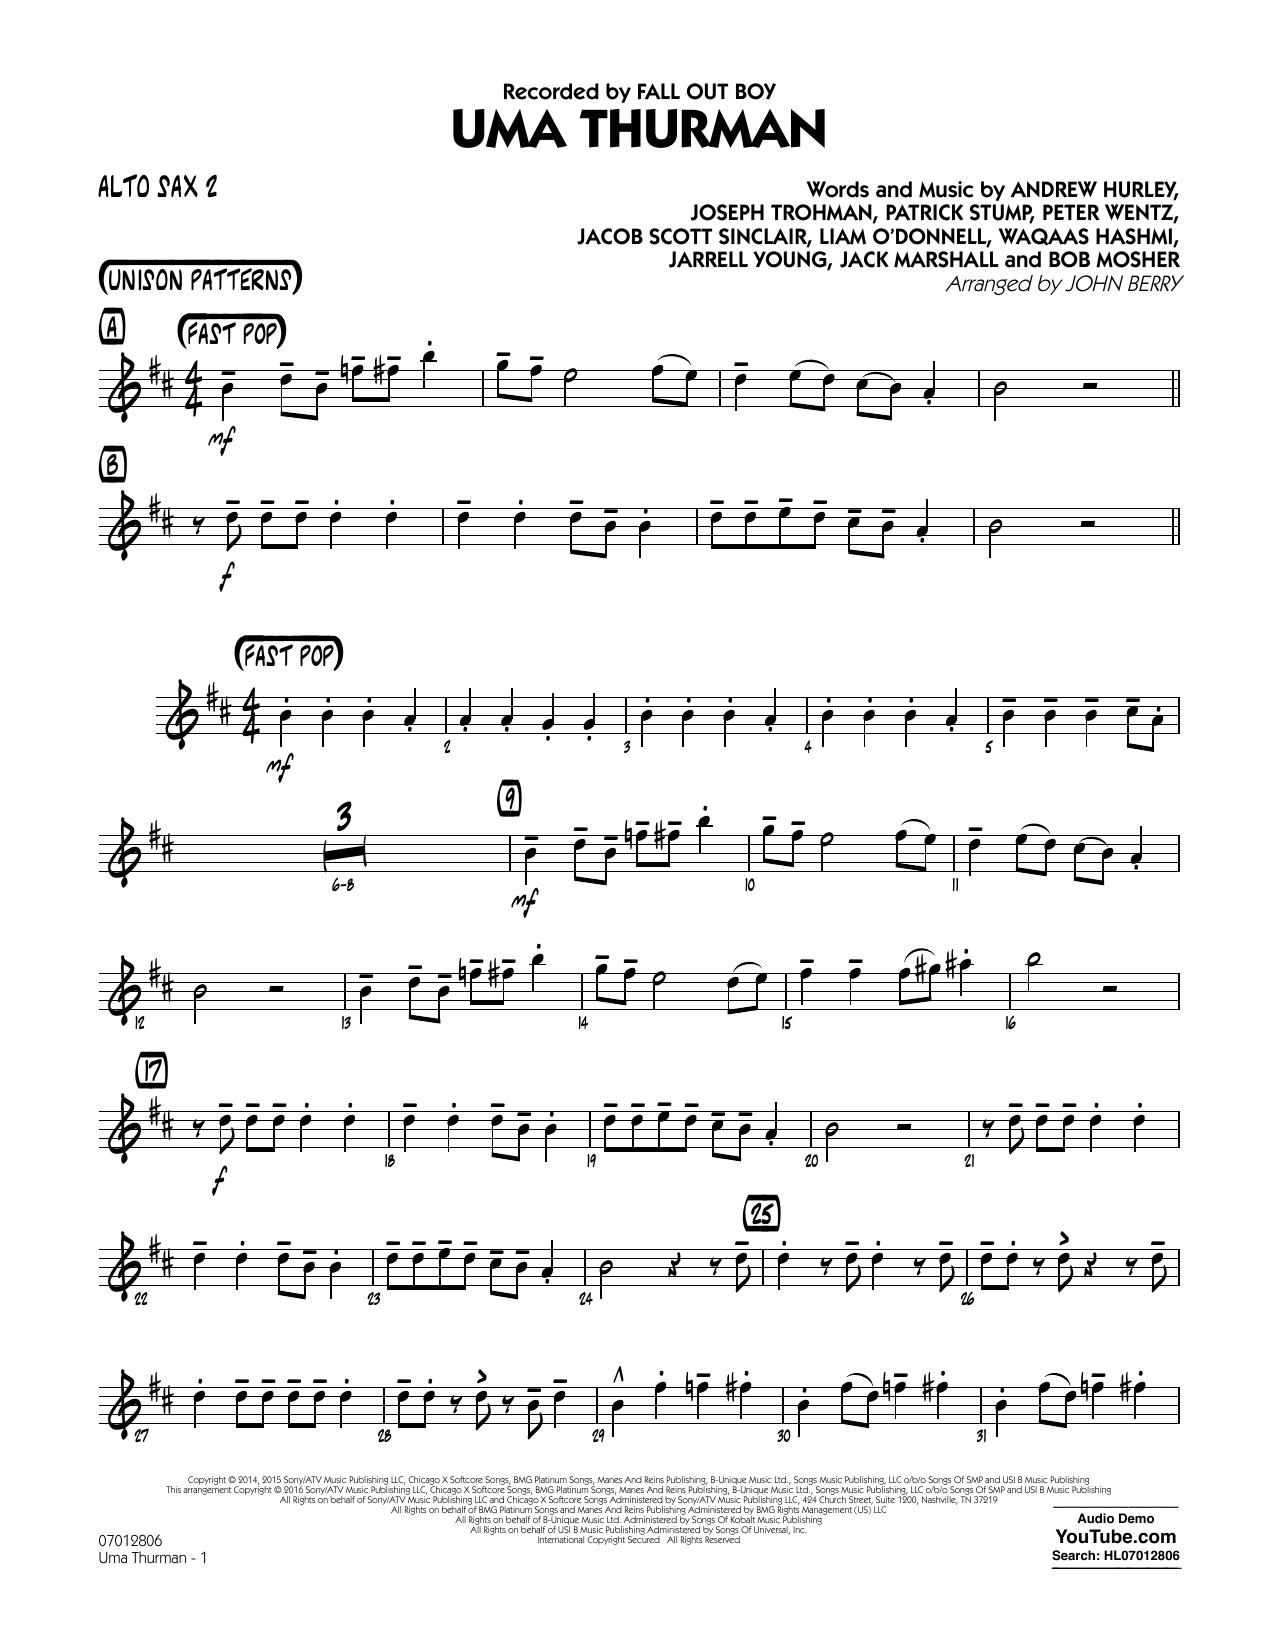 Fall Out Boy - Uma Thurman - Alto Sax 2